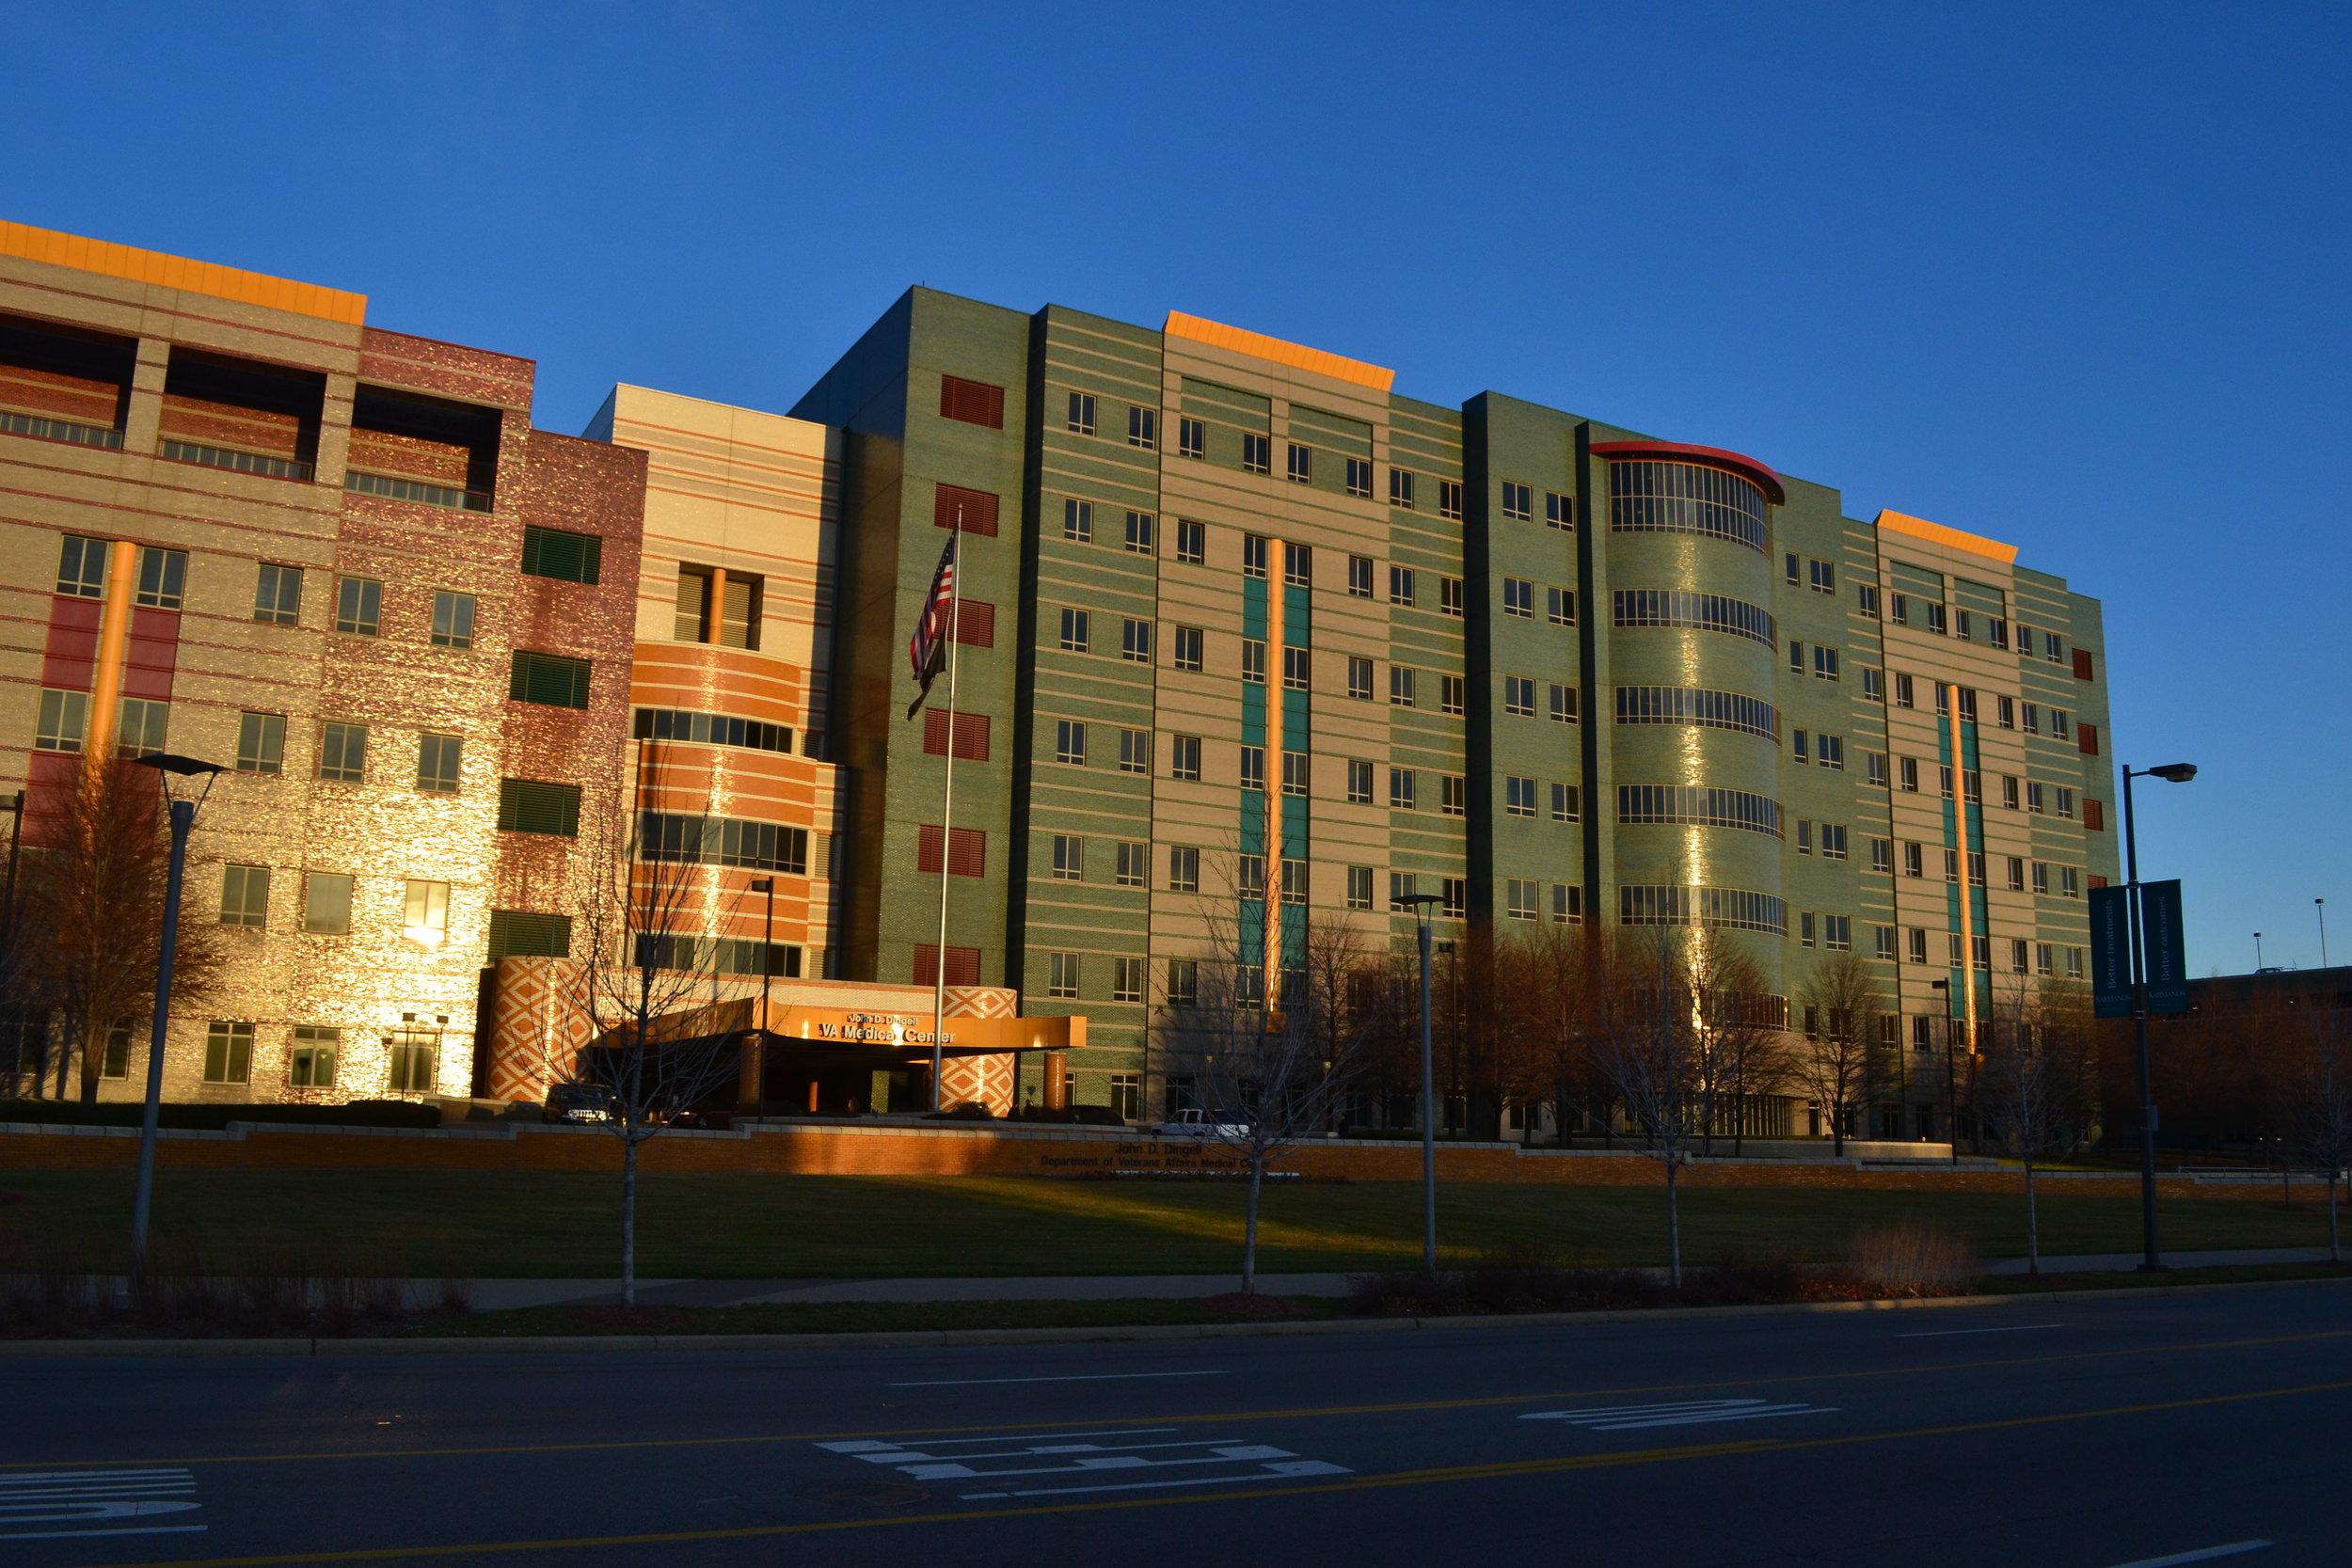 Nov. 27, 2012